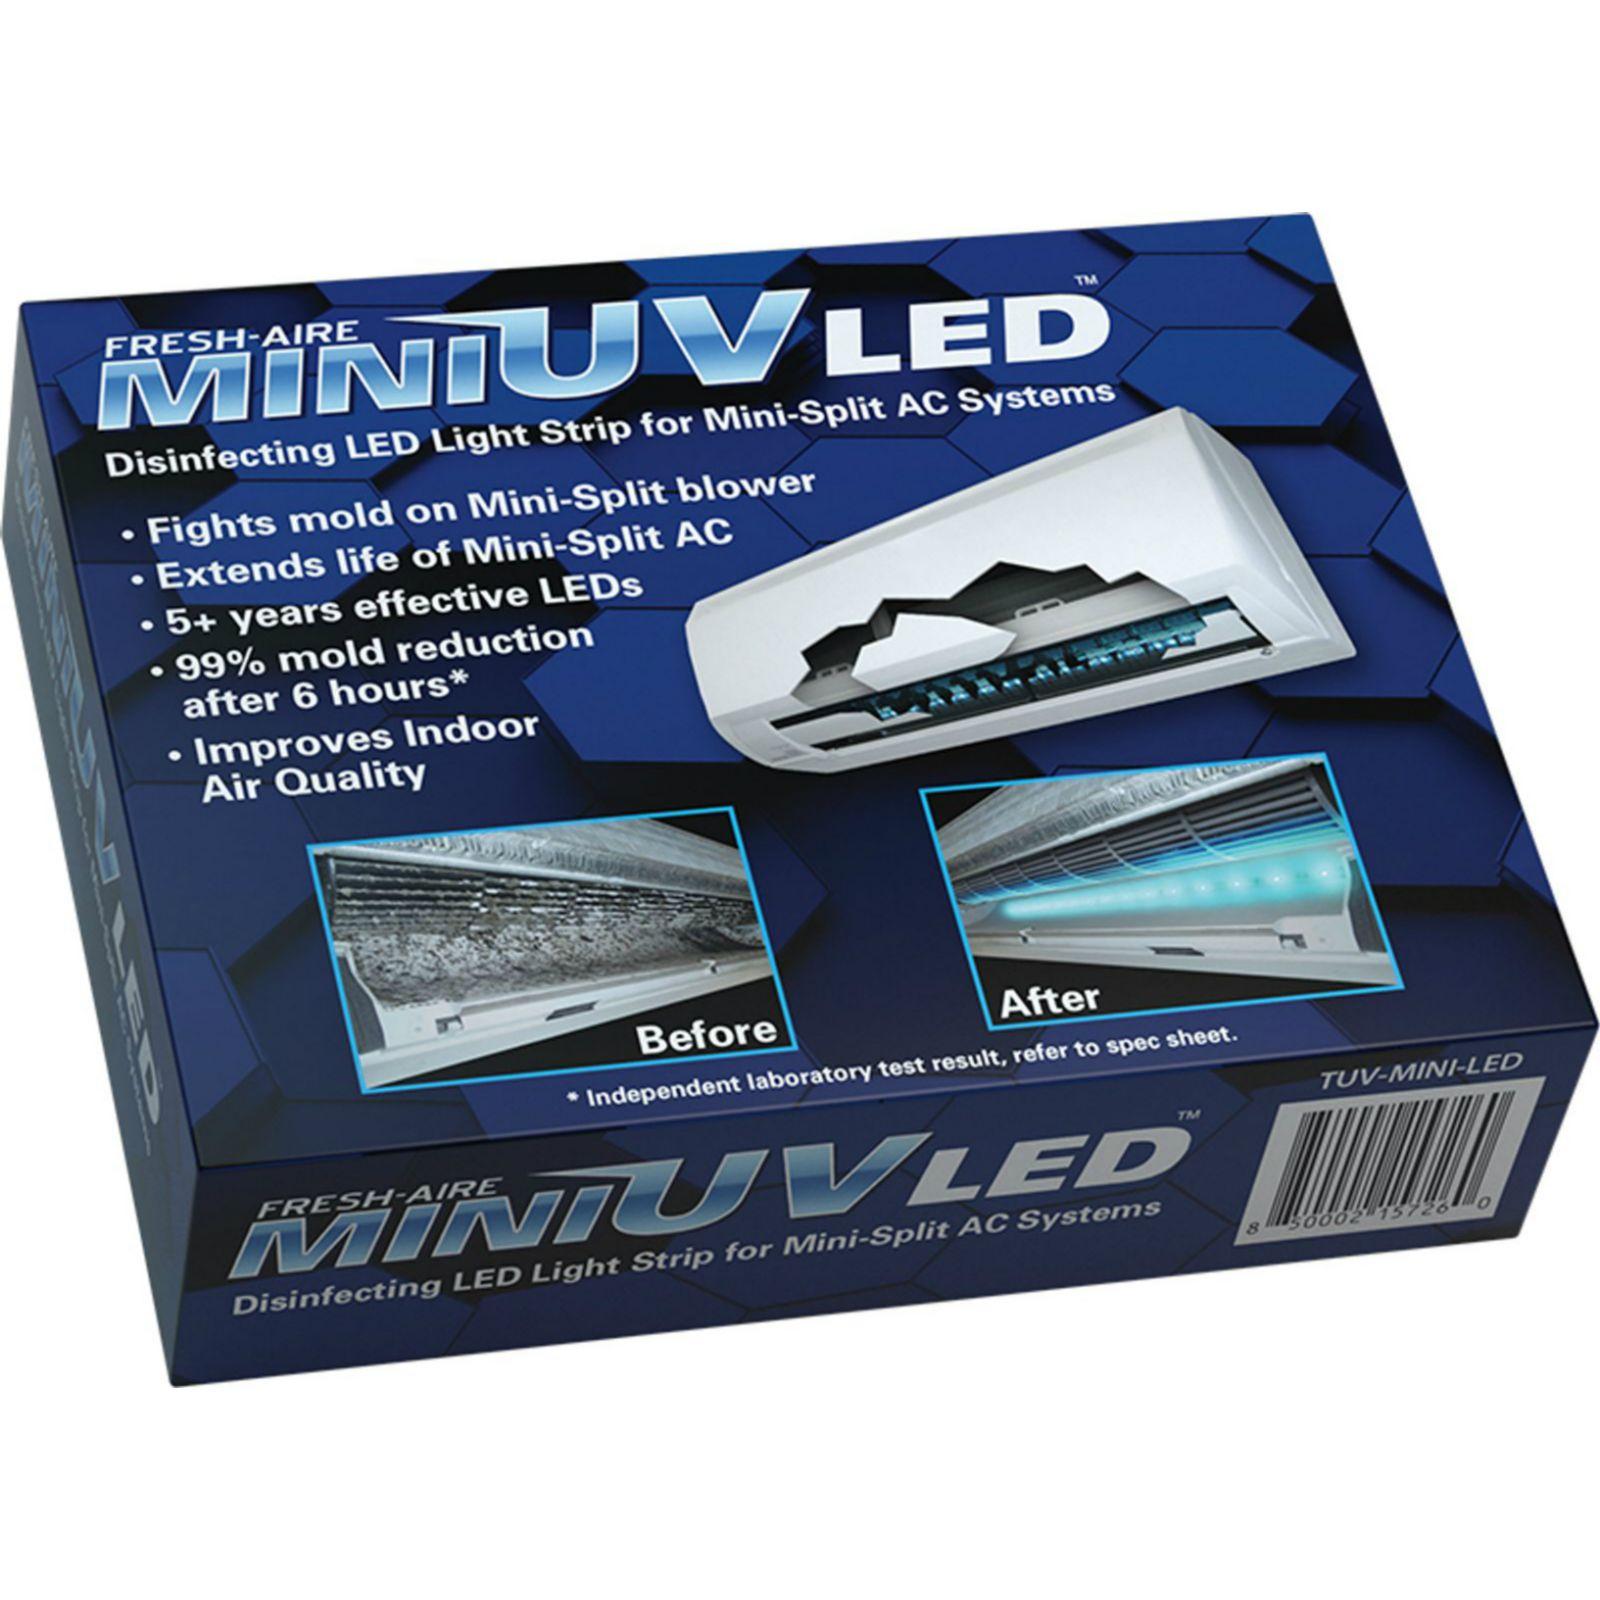 Fresh Aire Ductless Mini Uv Light System 120 277v Tuv Mini